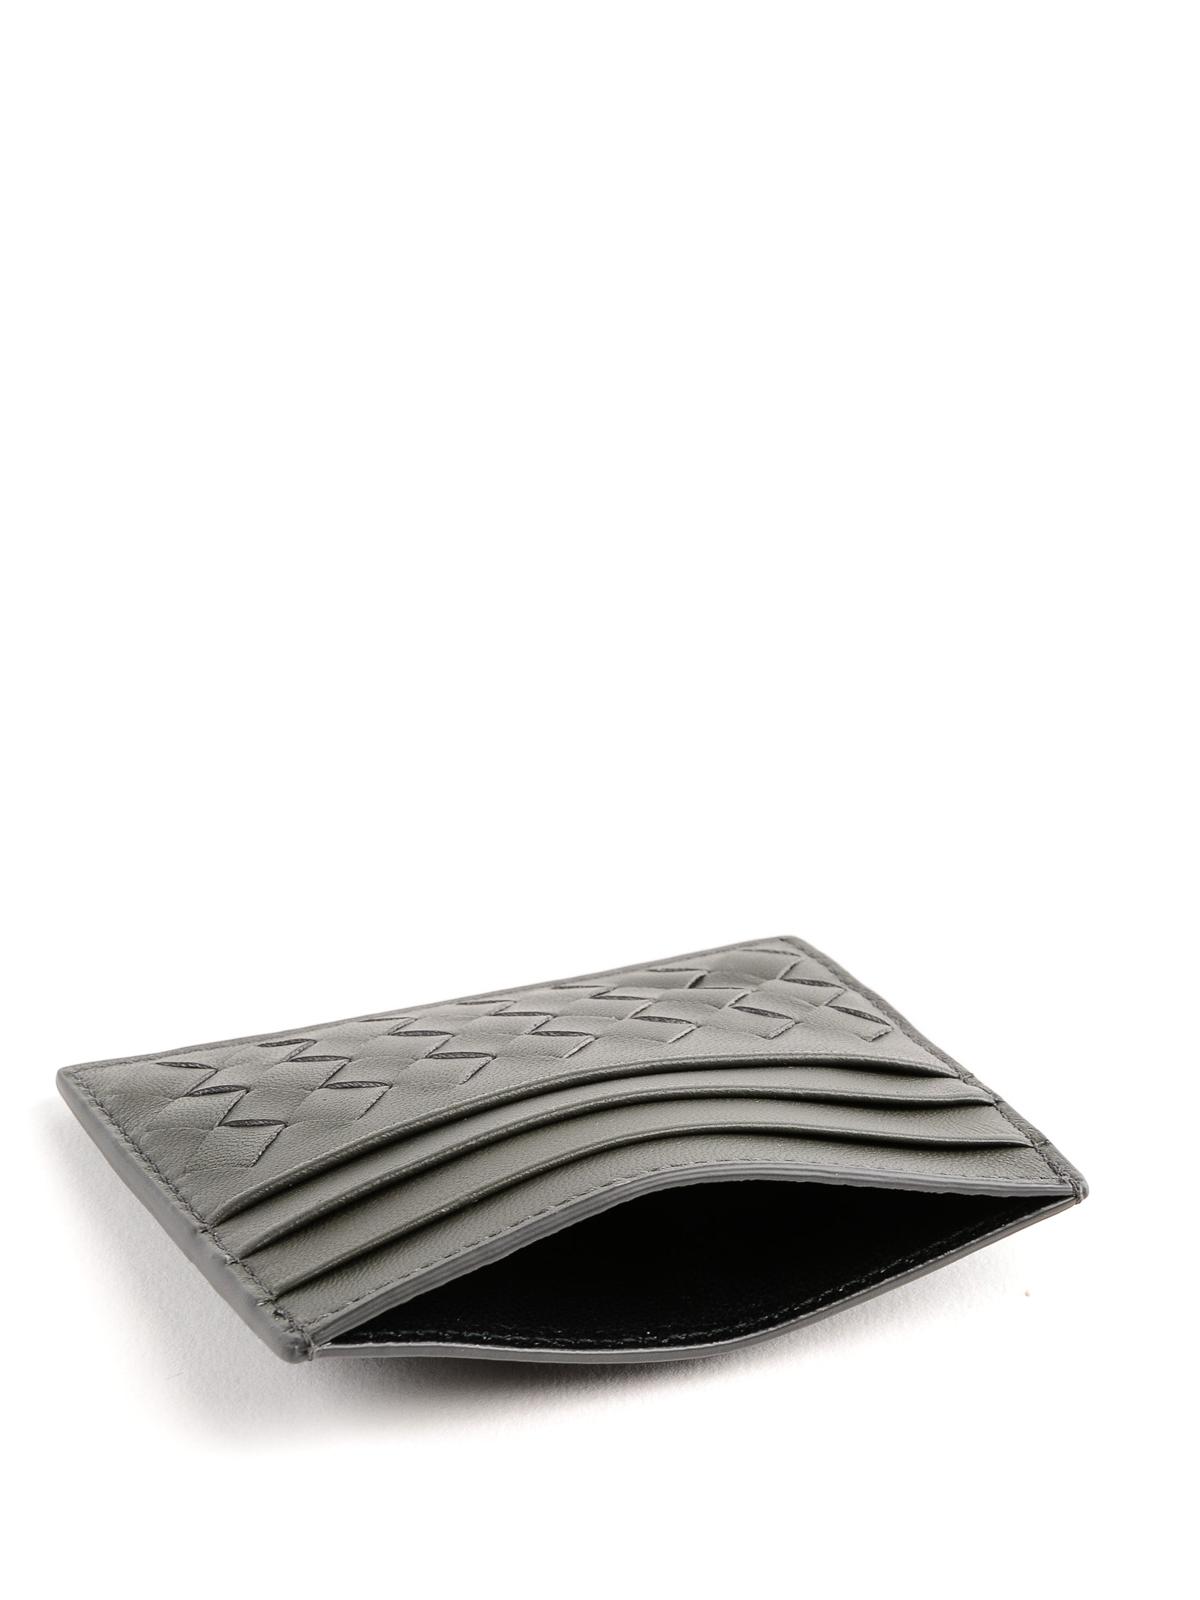 617058ef140ae Bottega Veneta - Intrecciato new light grey card holder - wallets ...